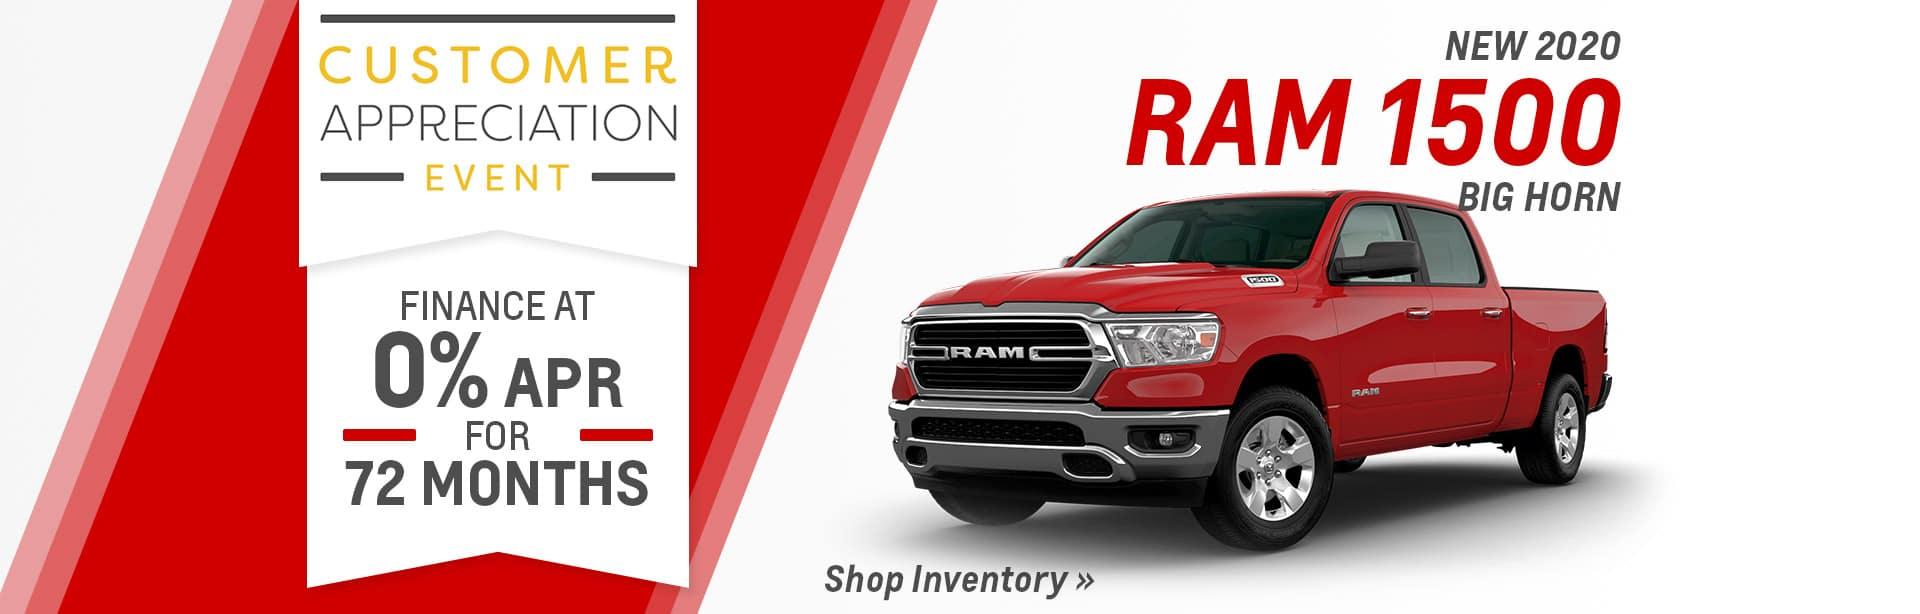 New RAM Truck Inventory near Fort Wayne, Indiana.